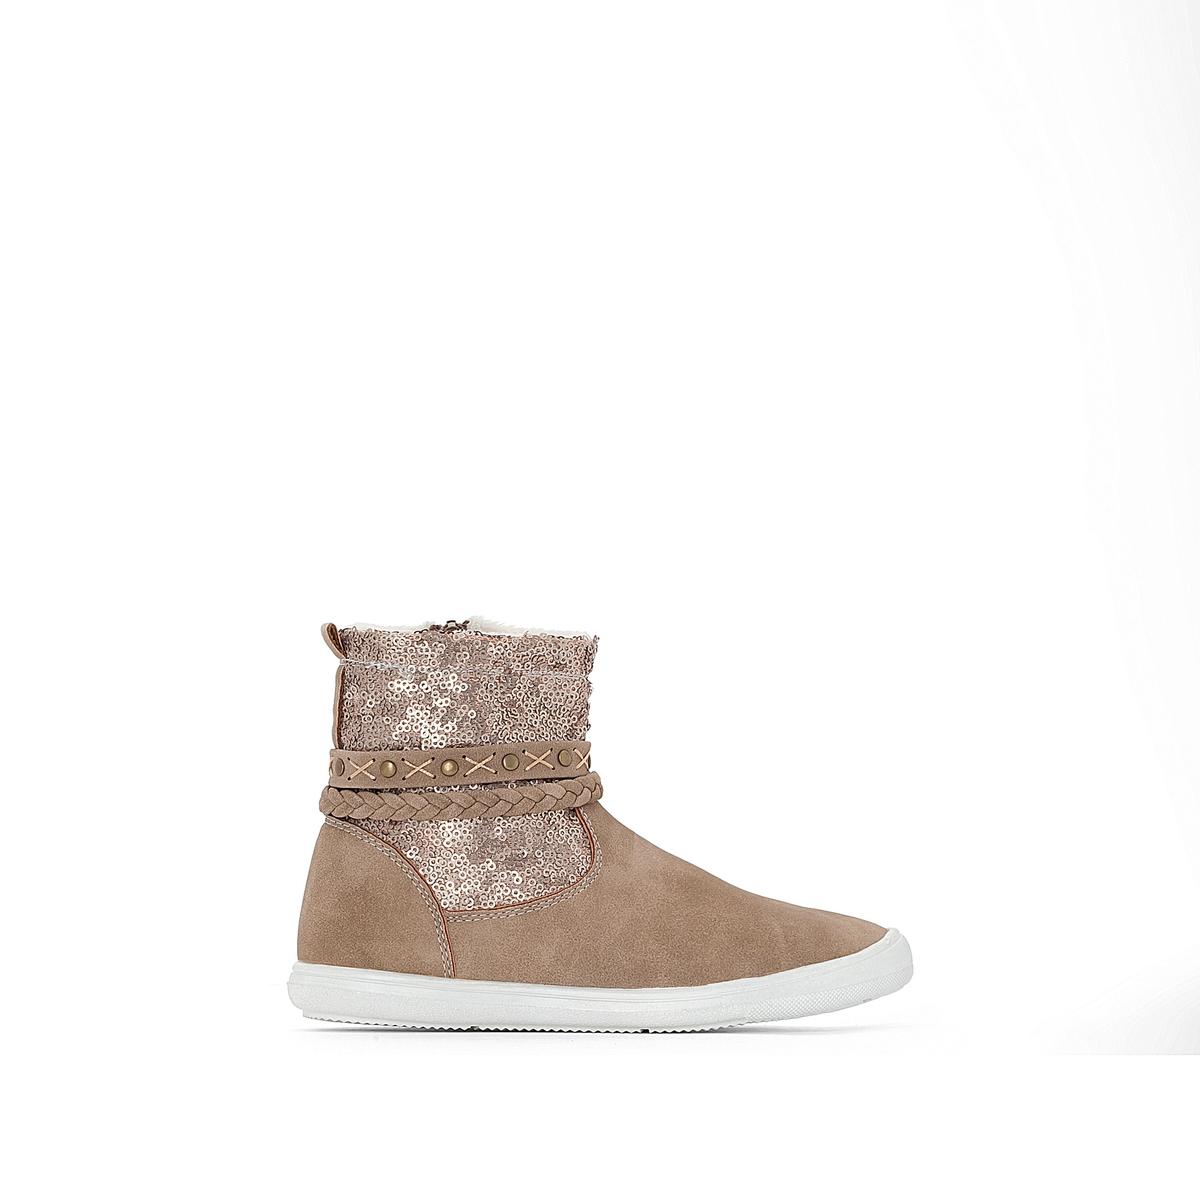 Ботинки на меховой подкладке с пайетками 26-35 от La Redoute Collections